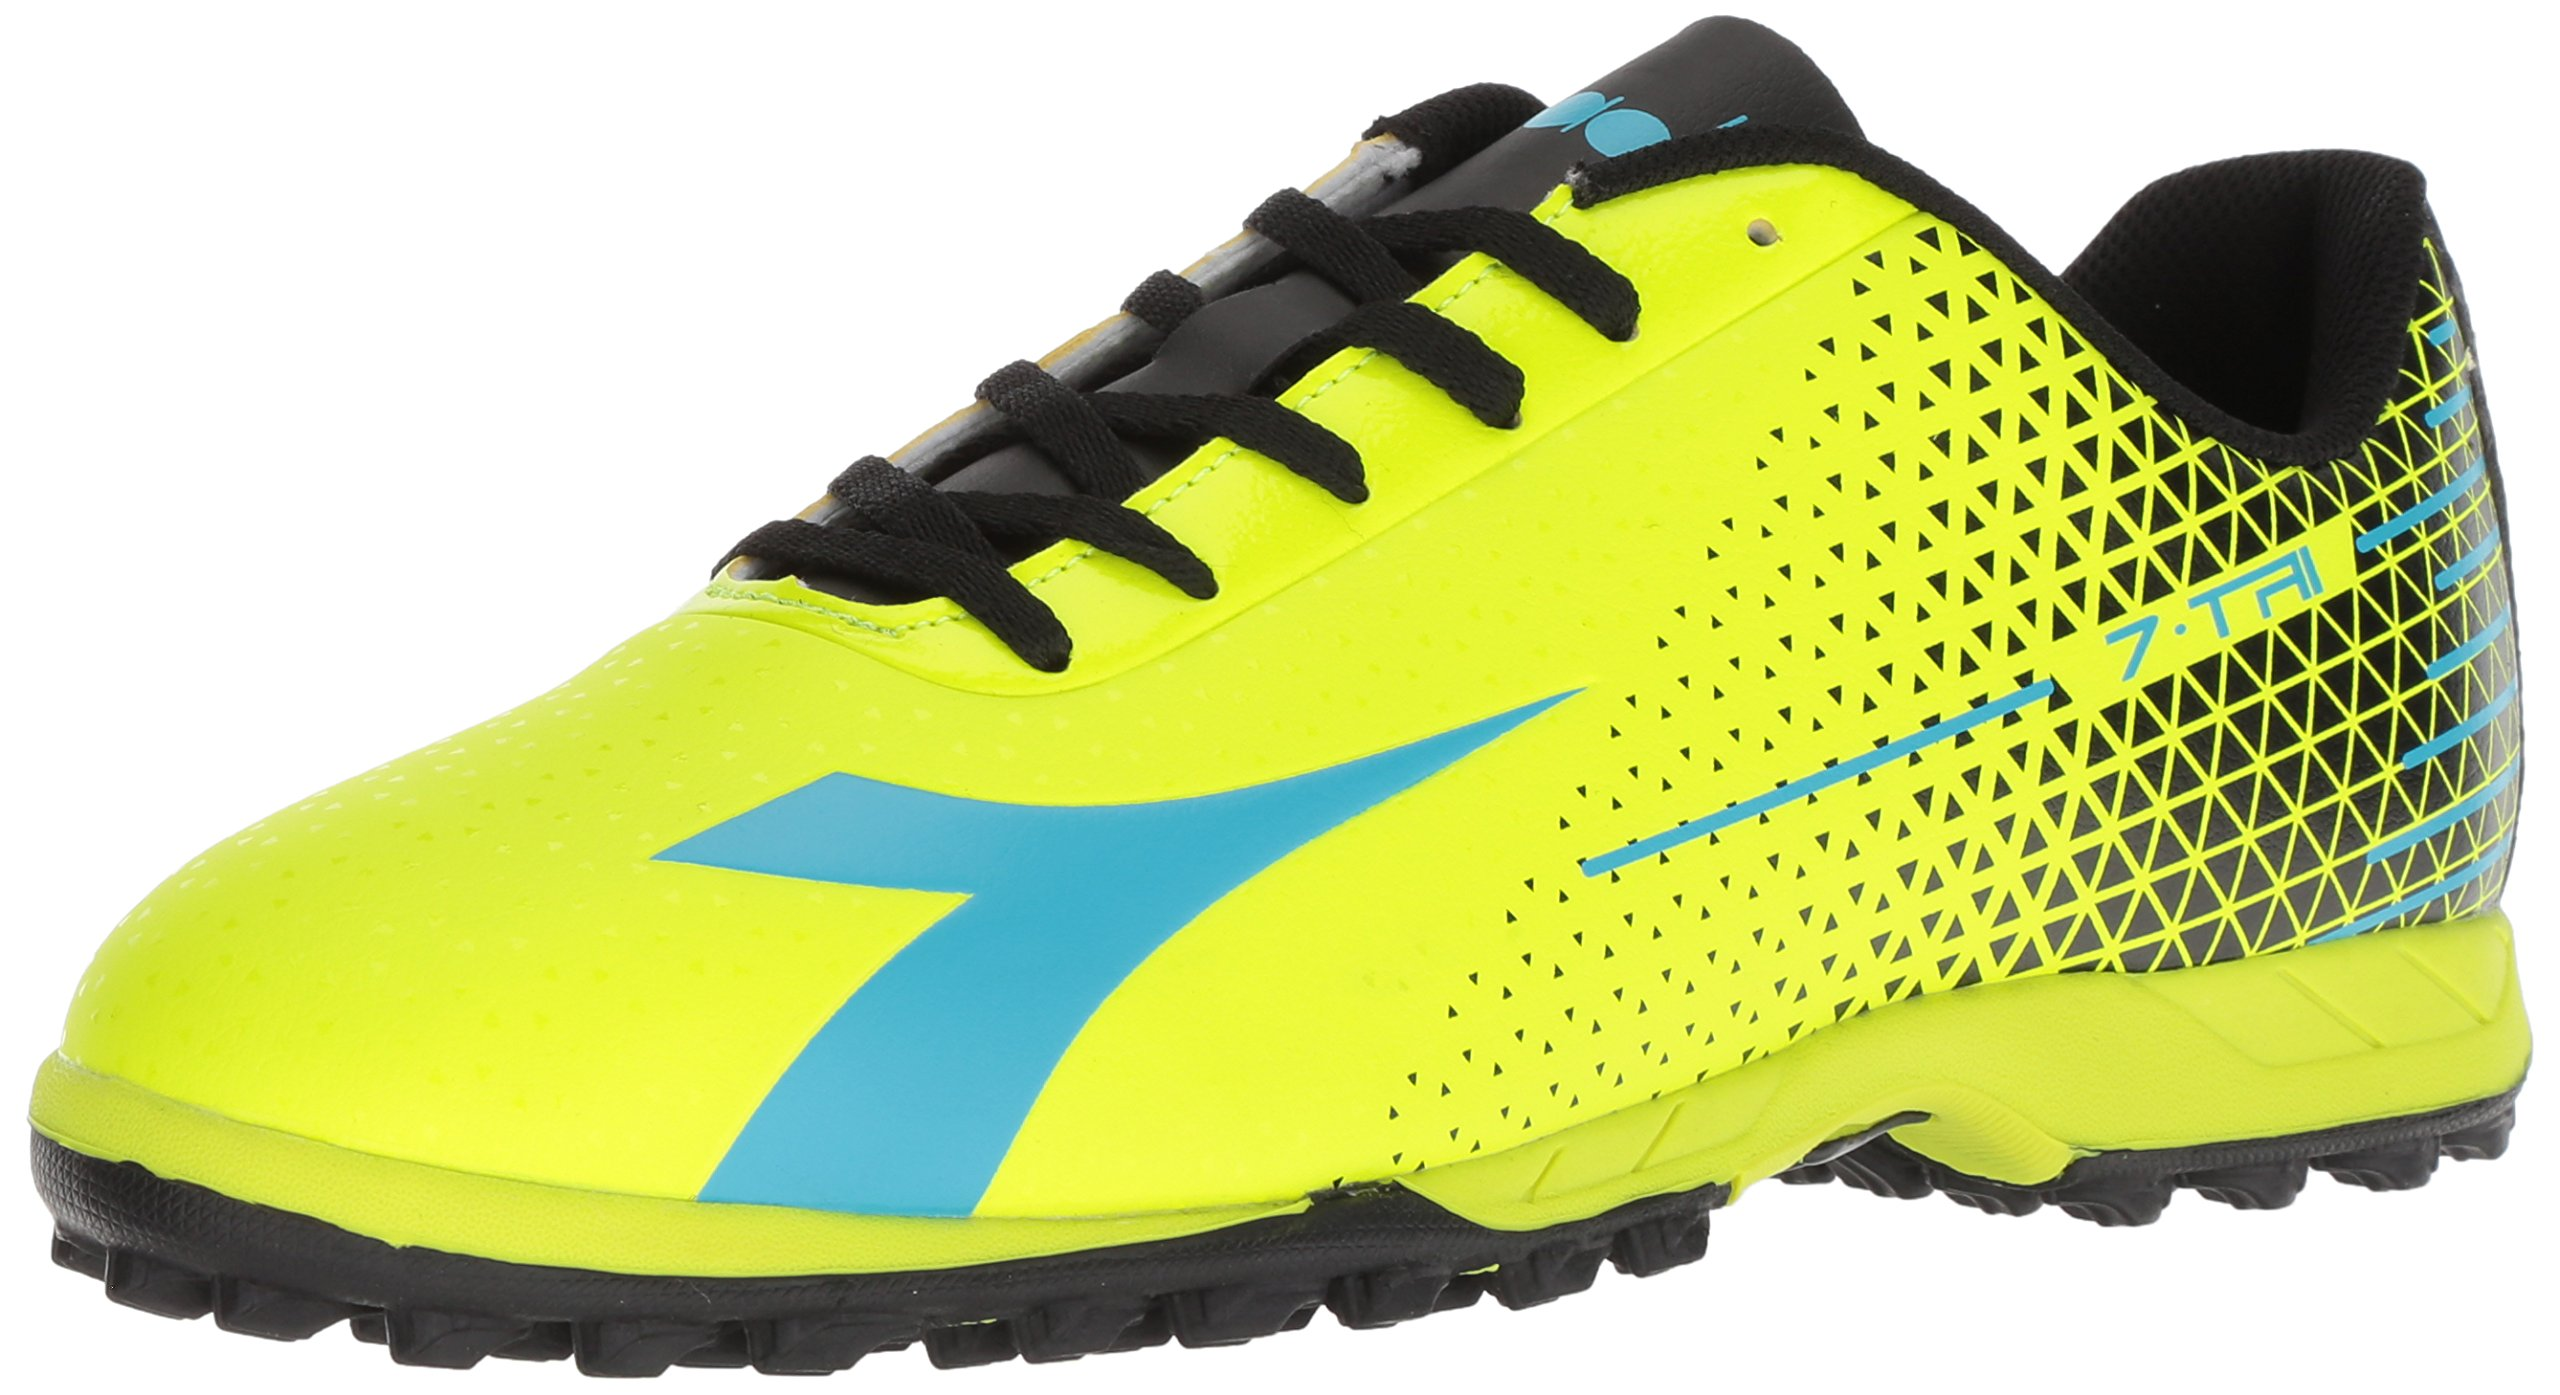 Diadora Soccer Men's 7-Tri TF, Flou Yellow/Flou Blue/Black, 9 Medium US